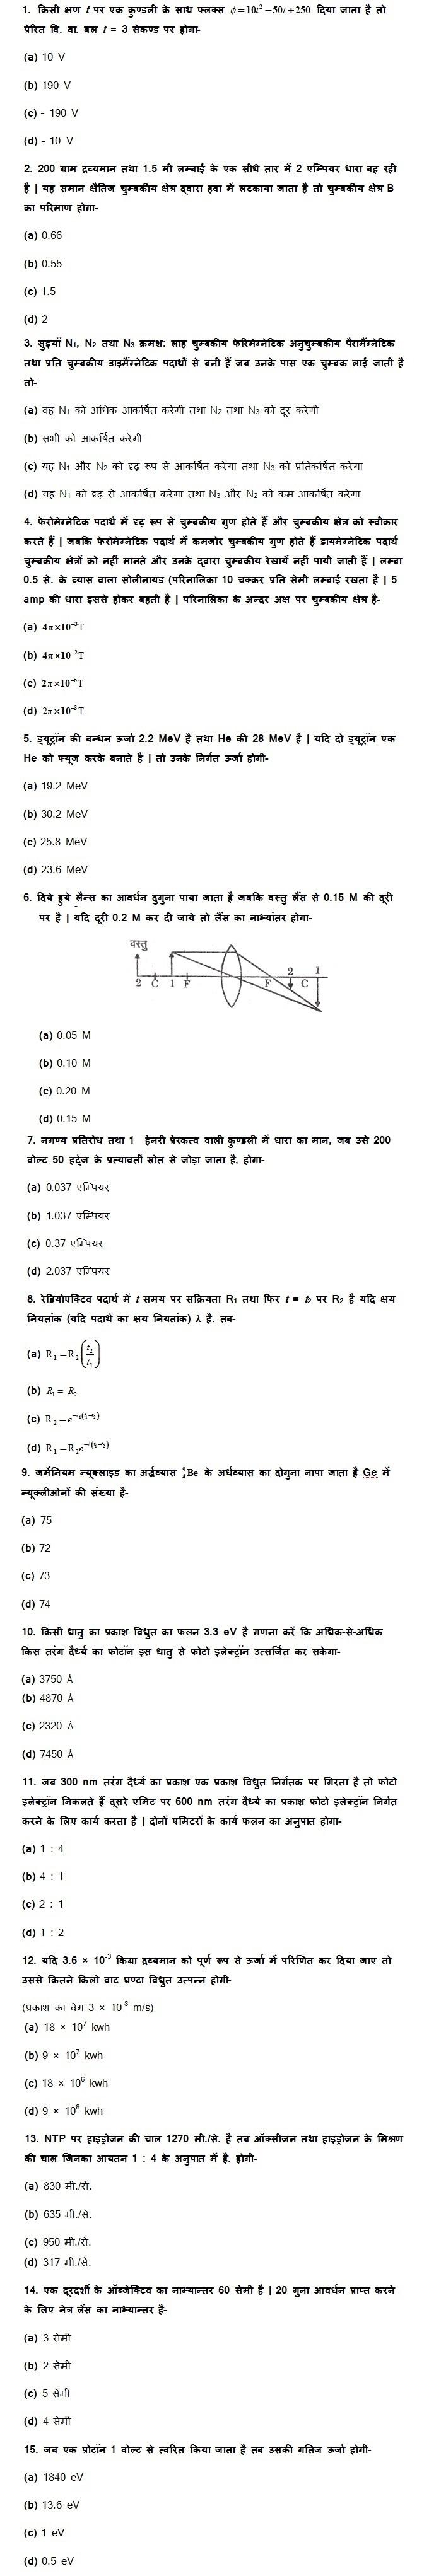 UP Board Class 12th Physics MCQ Test Set: 1 6